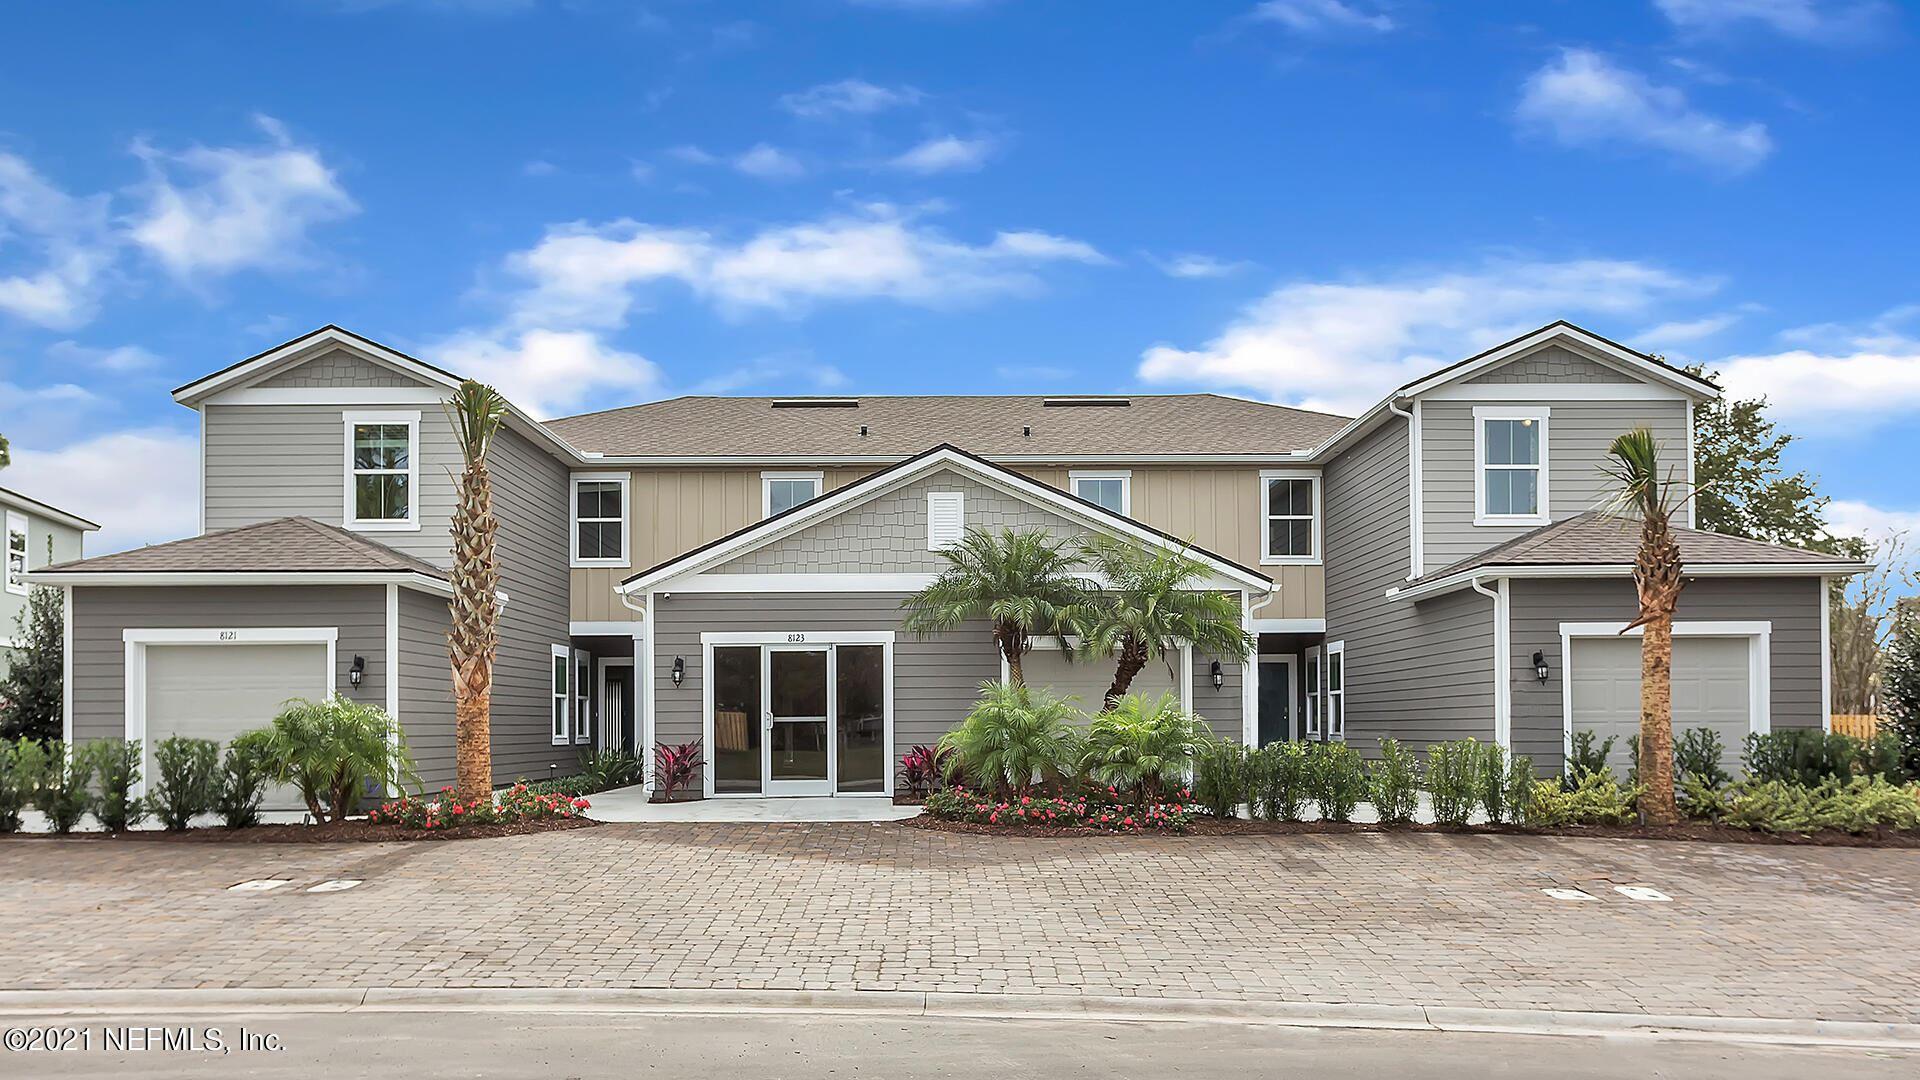 9616 BAYLIN CT #Lot No: 174, Jacksonville, FL 32256 - MLS#: 1099906